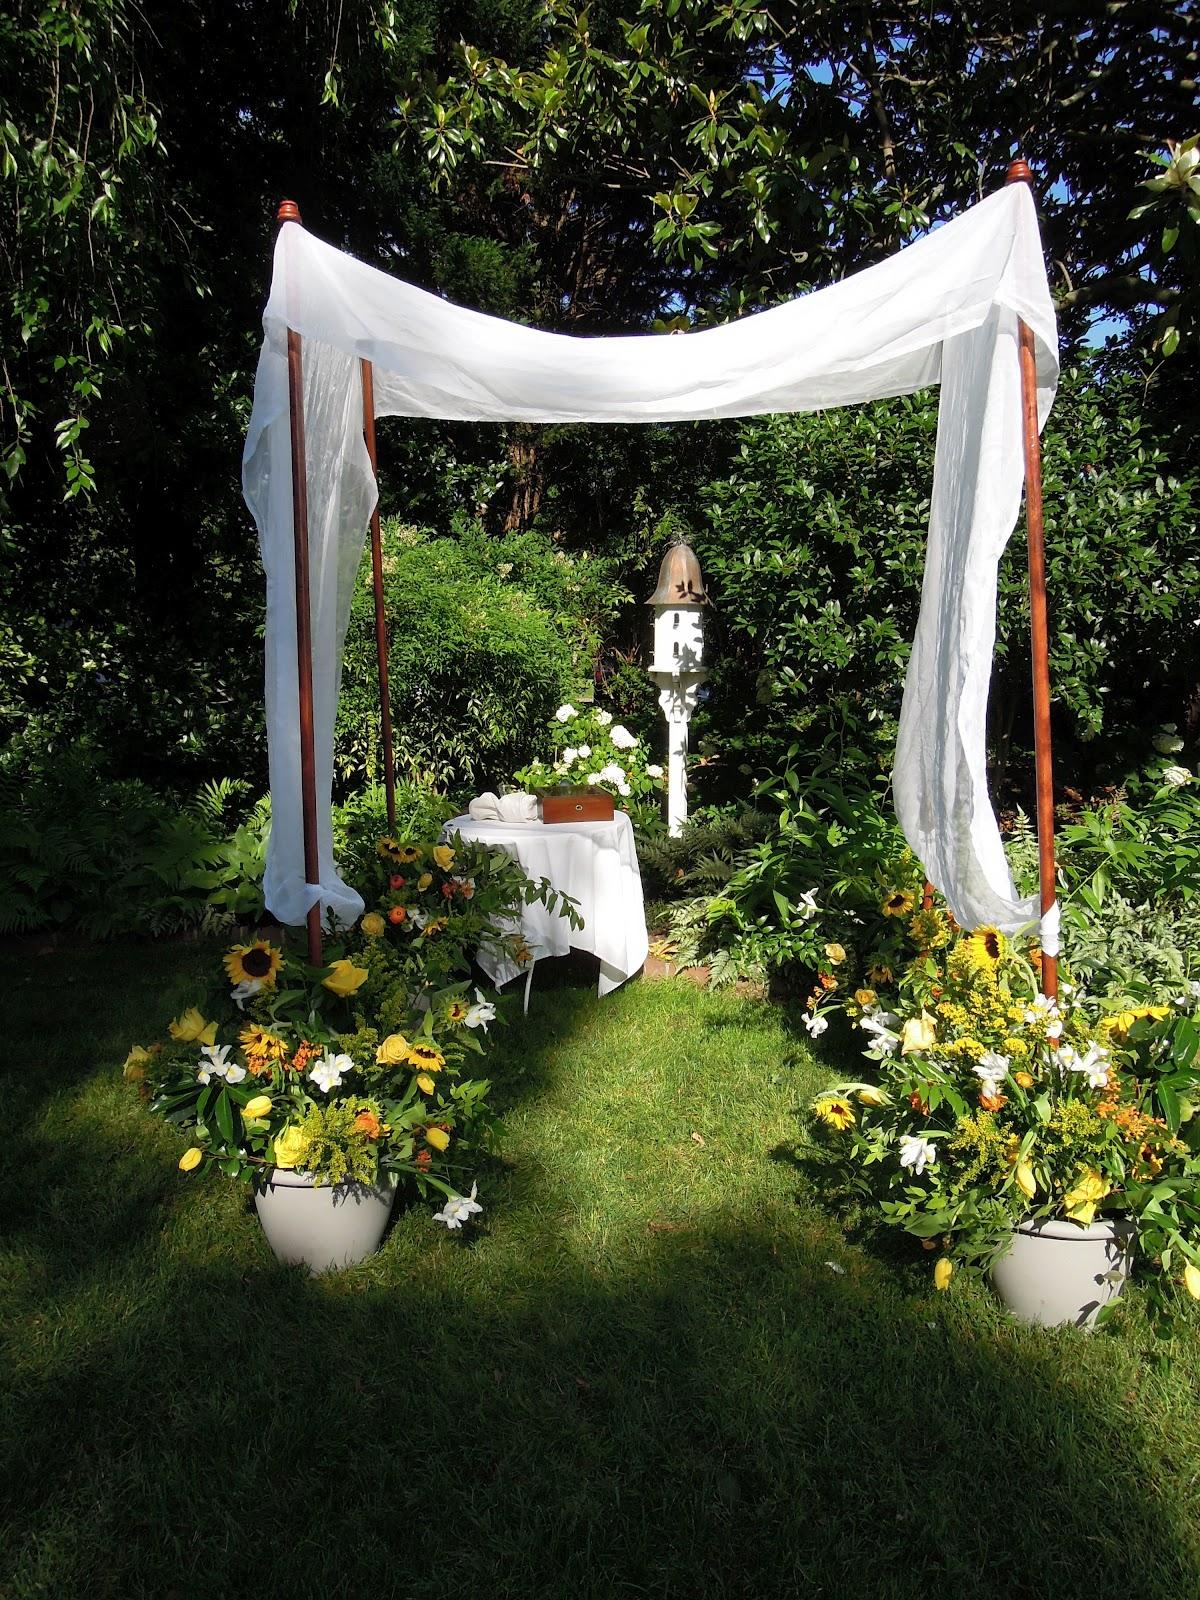 Michaels Cake Decorating Class Raleigh Nc : Raleigh Wedding Blog: Wonderful Interfaith Wedding for ...